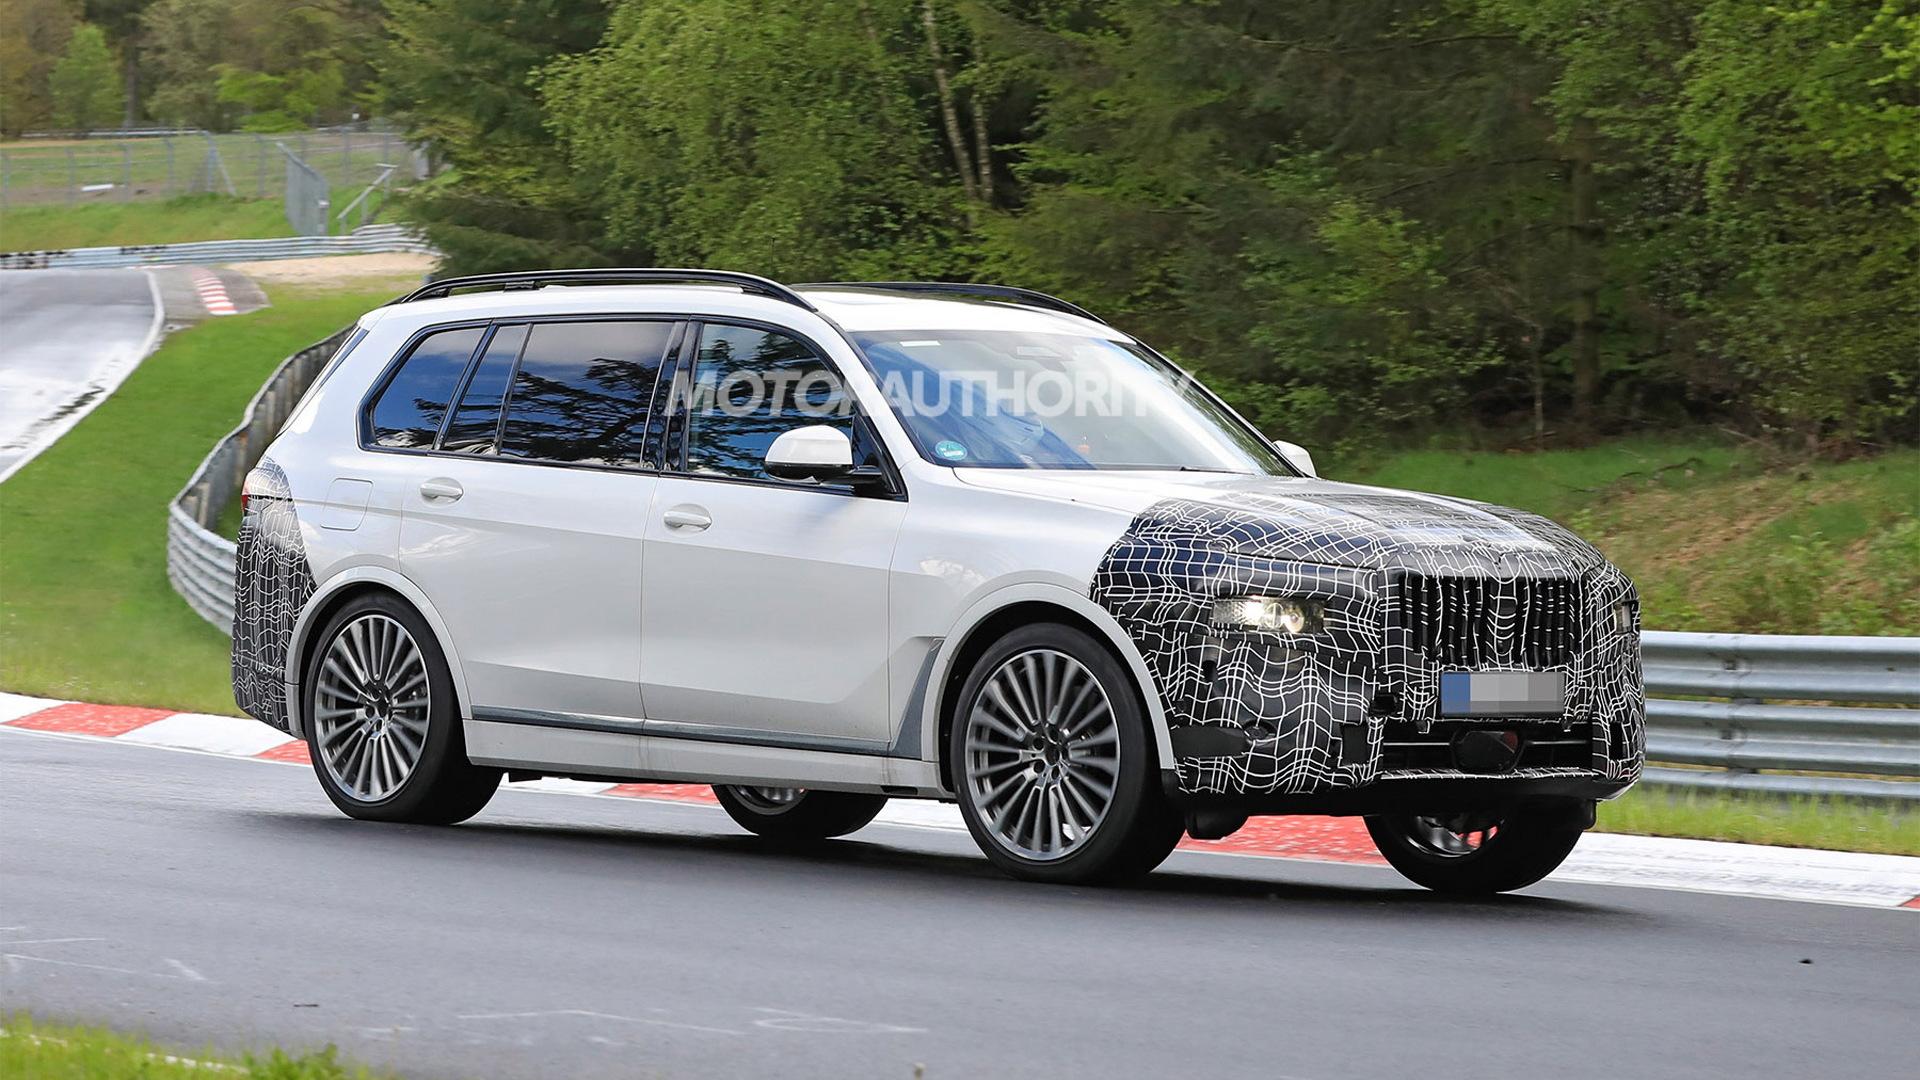 2023 BMW X7 facelift spy shots - Photo credit:S. Baldauf/SB-Medien